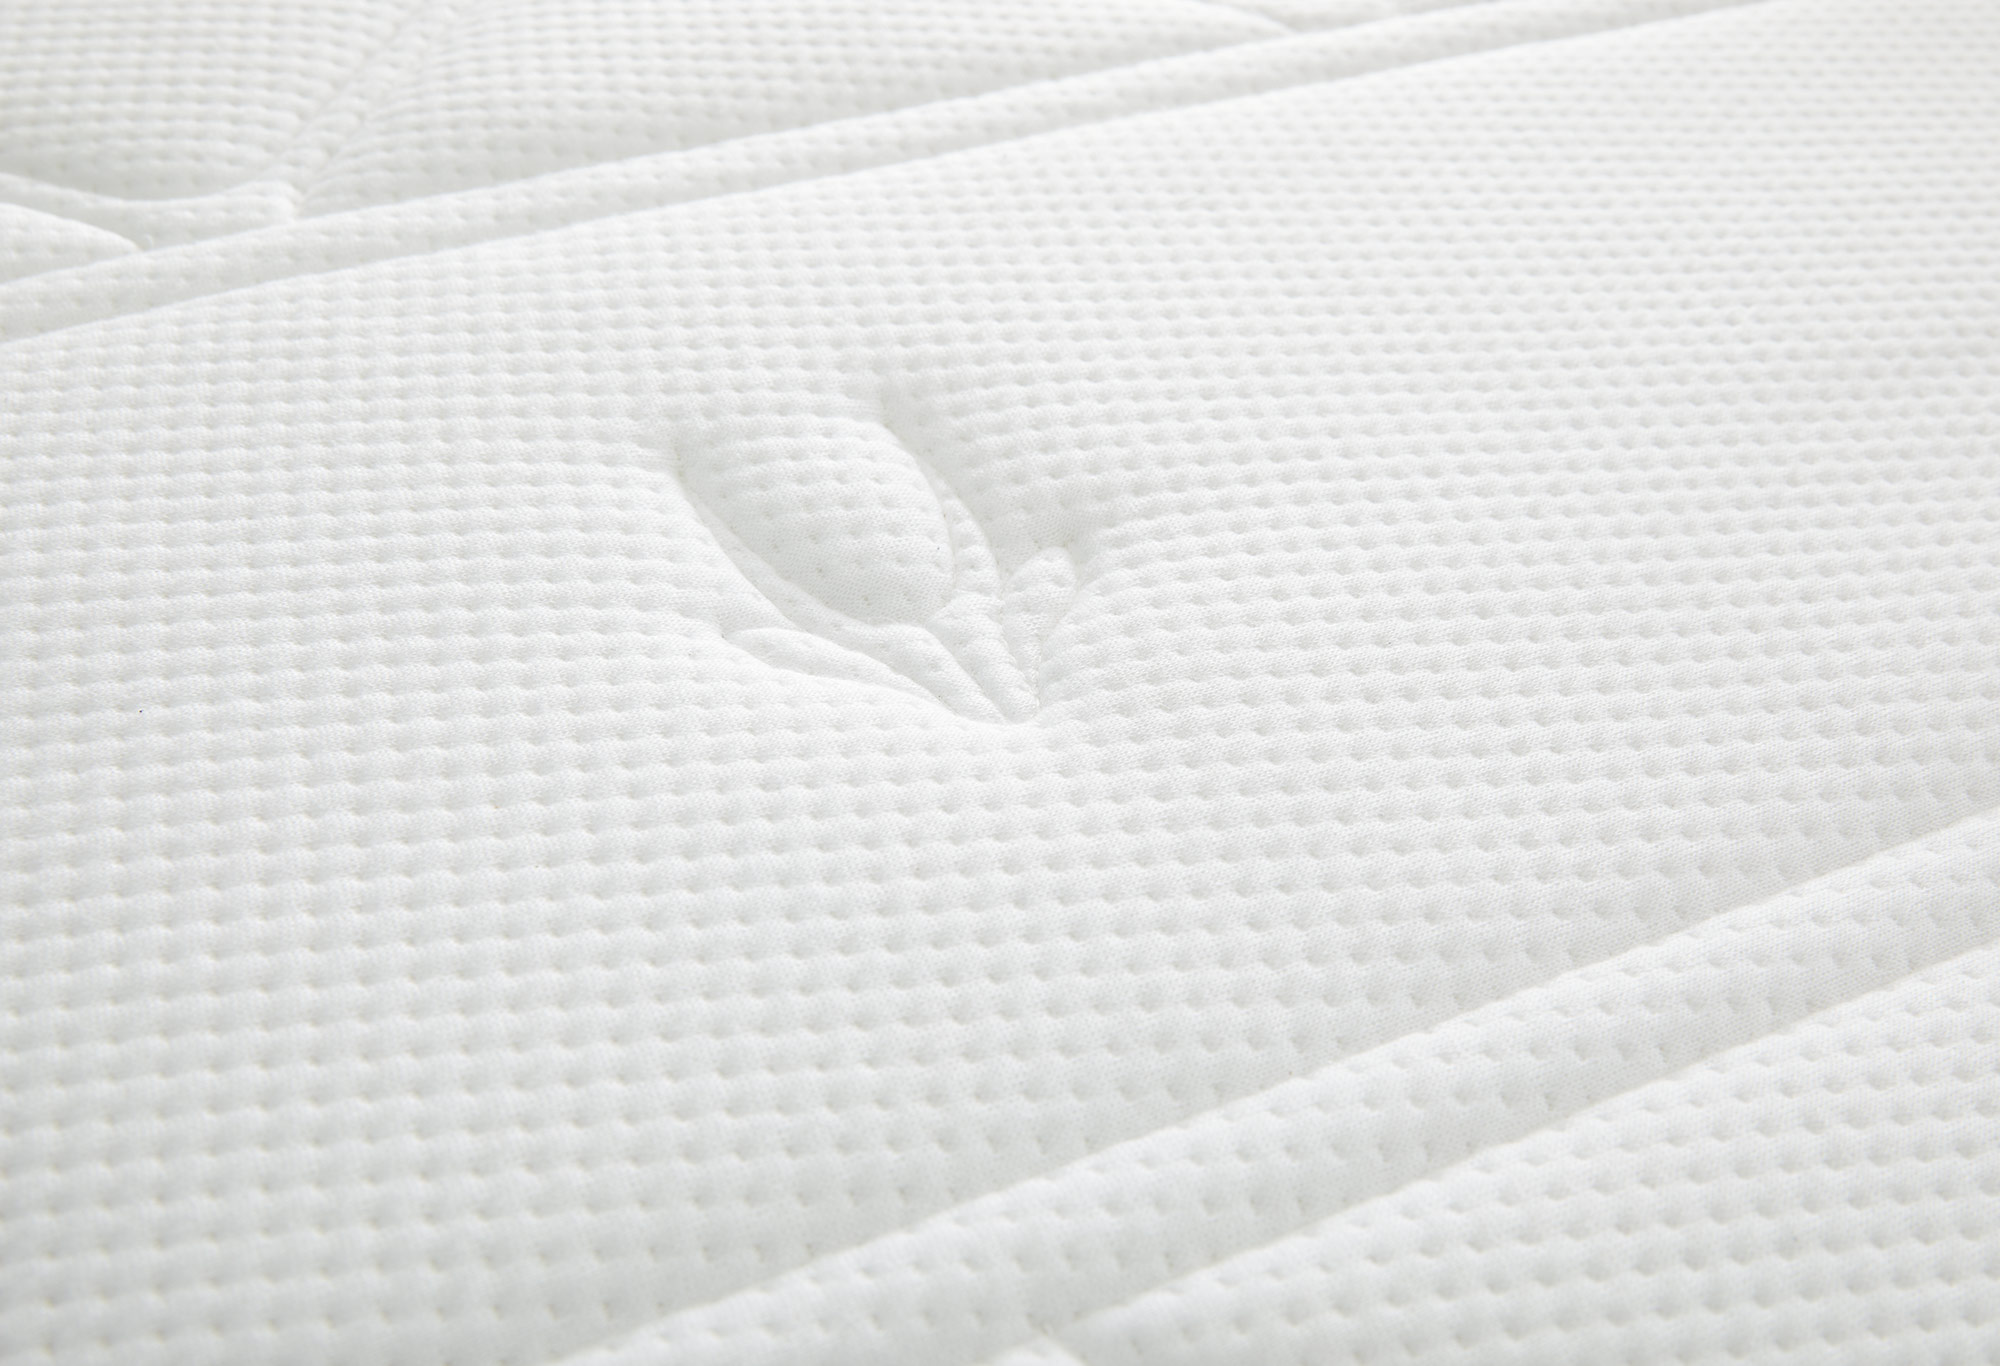 Gazella Comfort IV Pocketvering Matras Detail | Swiss Sense